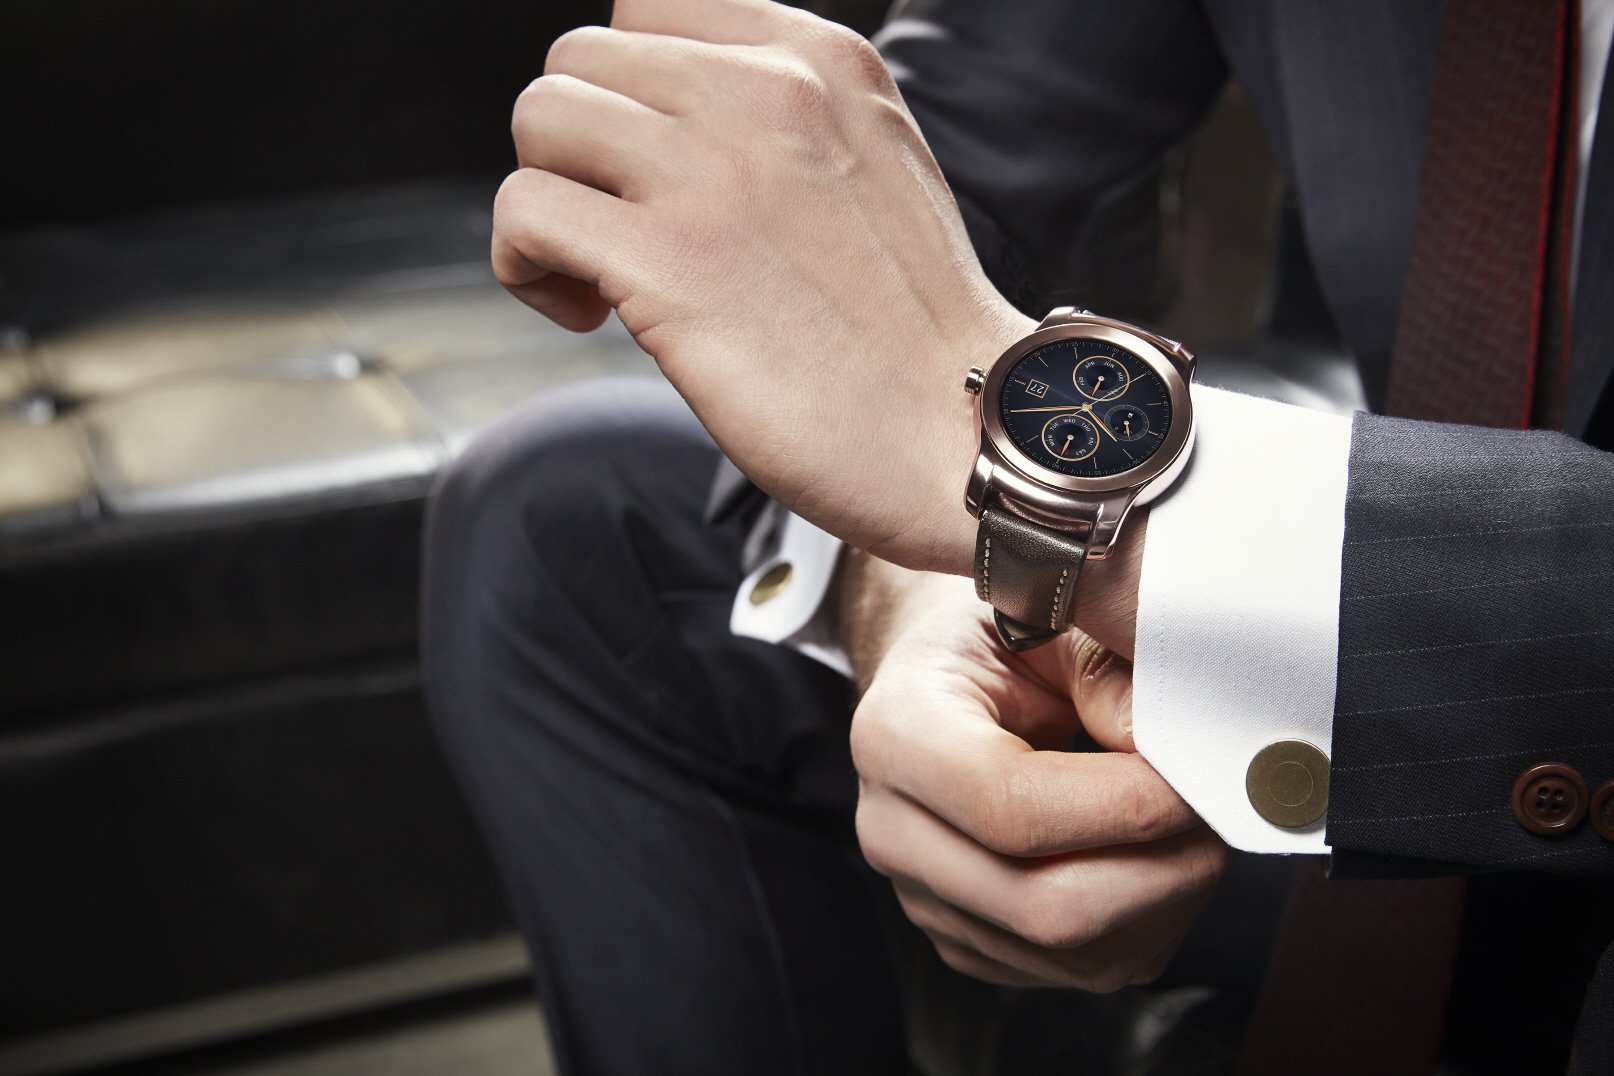 Raffaele Cinquegrana ci presenta LG Watch Urbane